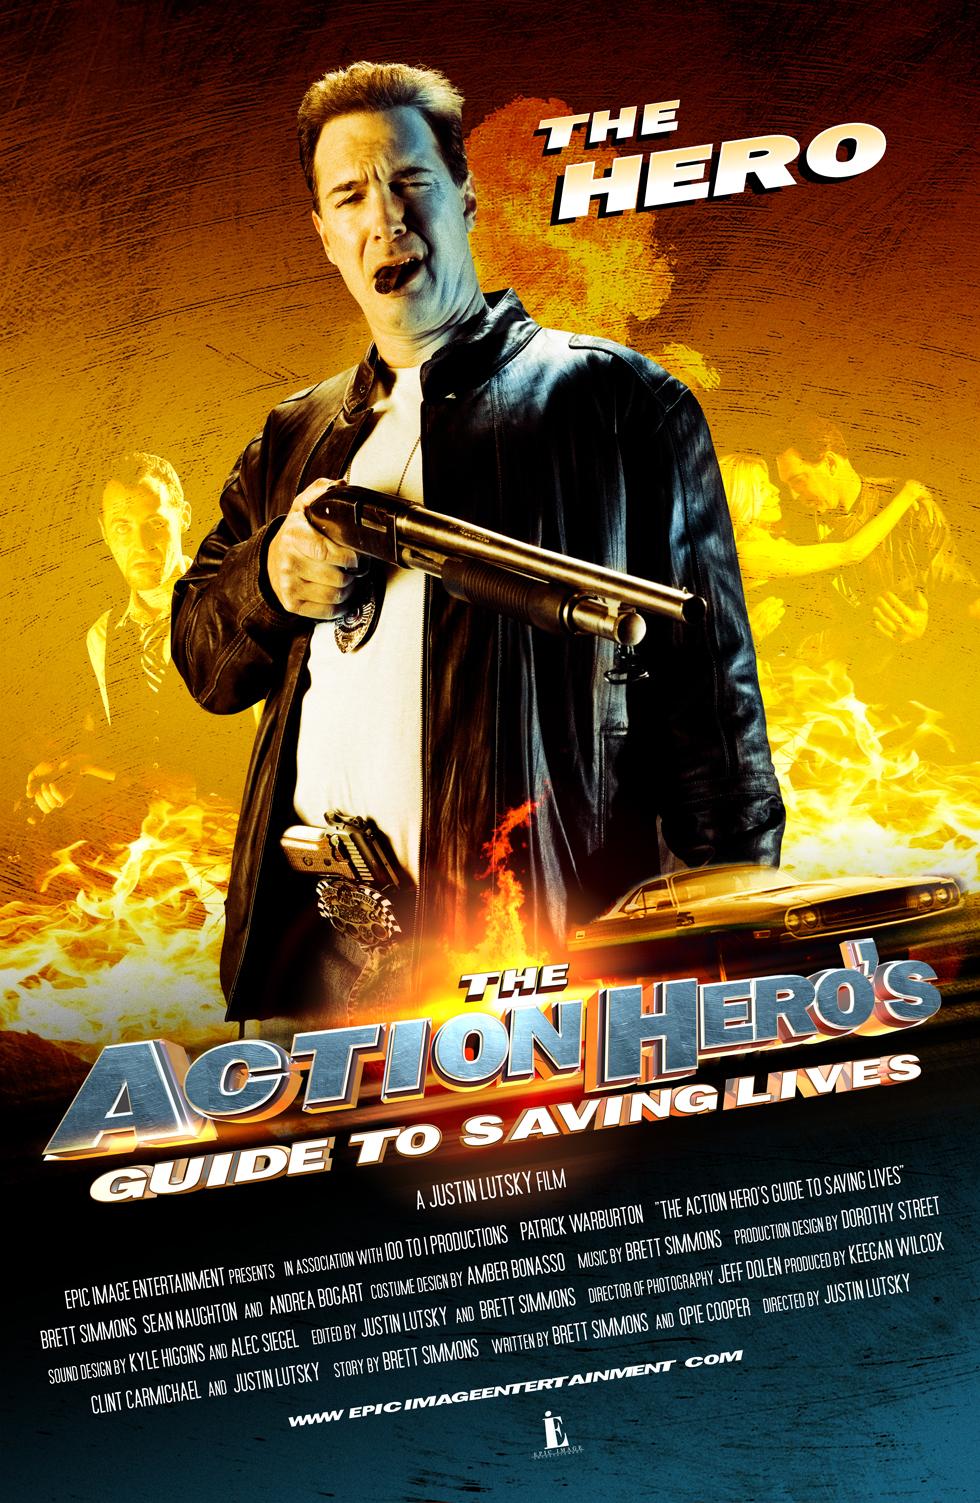 AHGTSL_Hero_poster